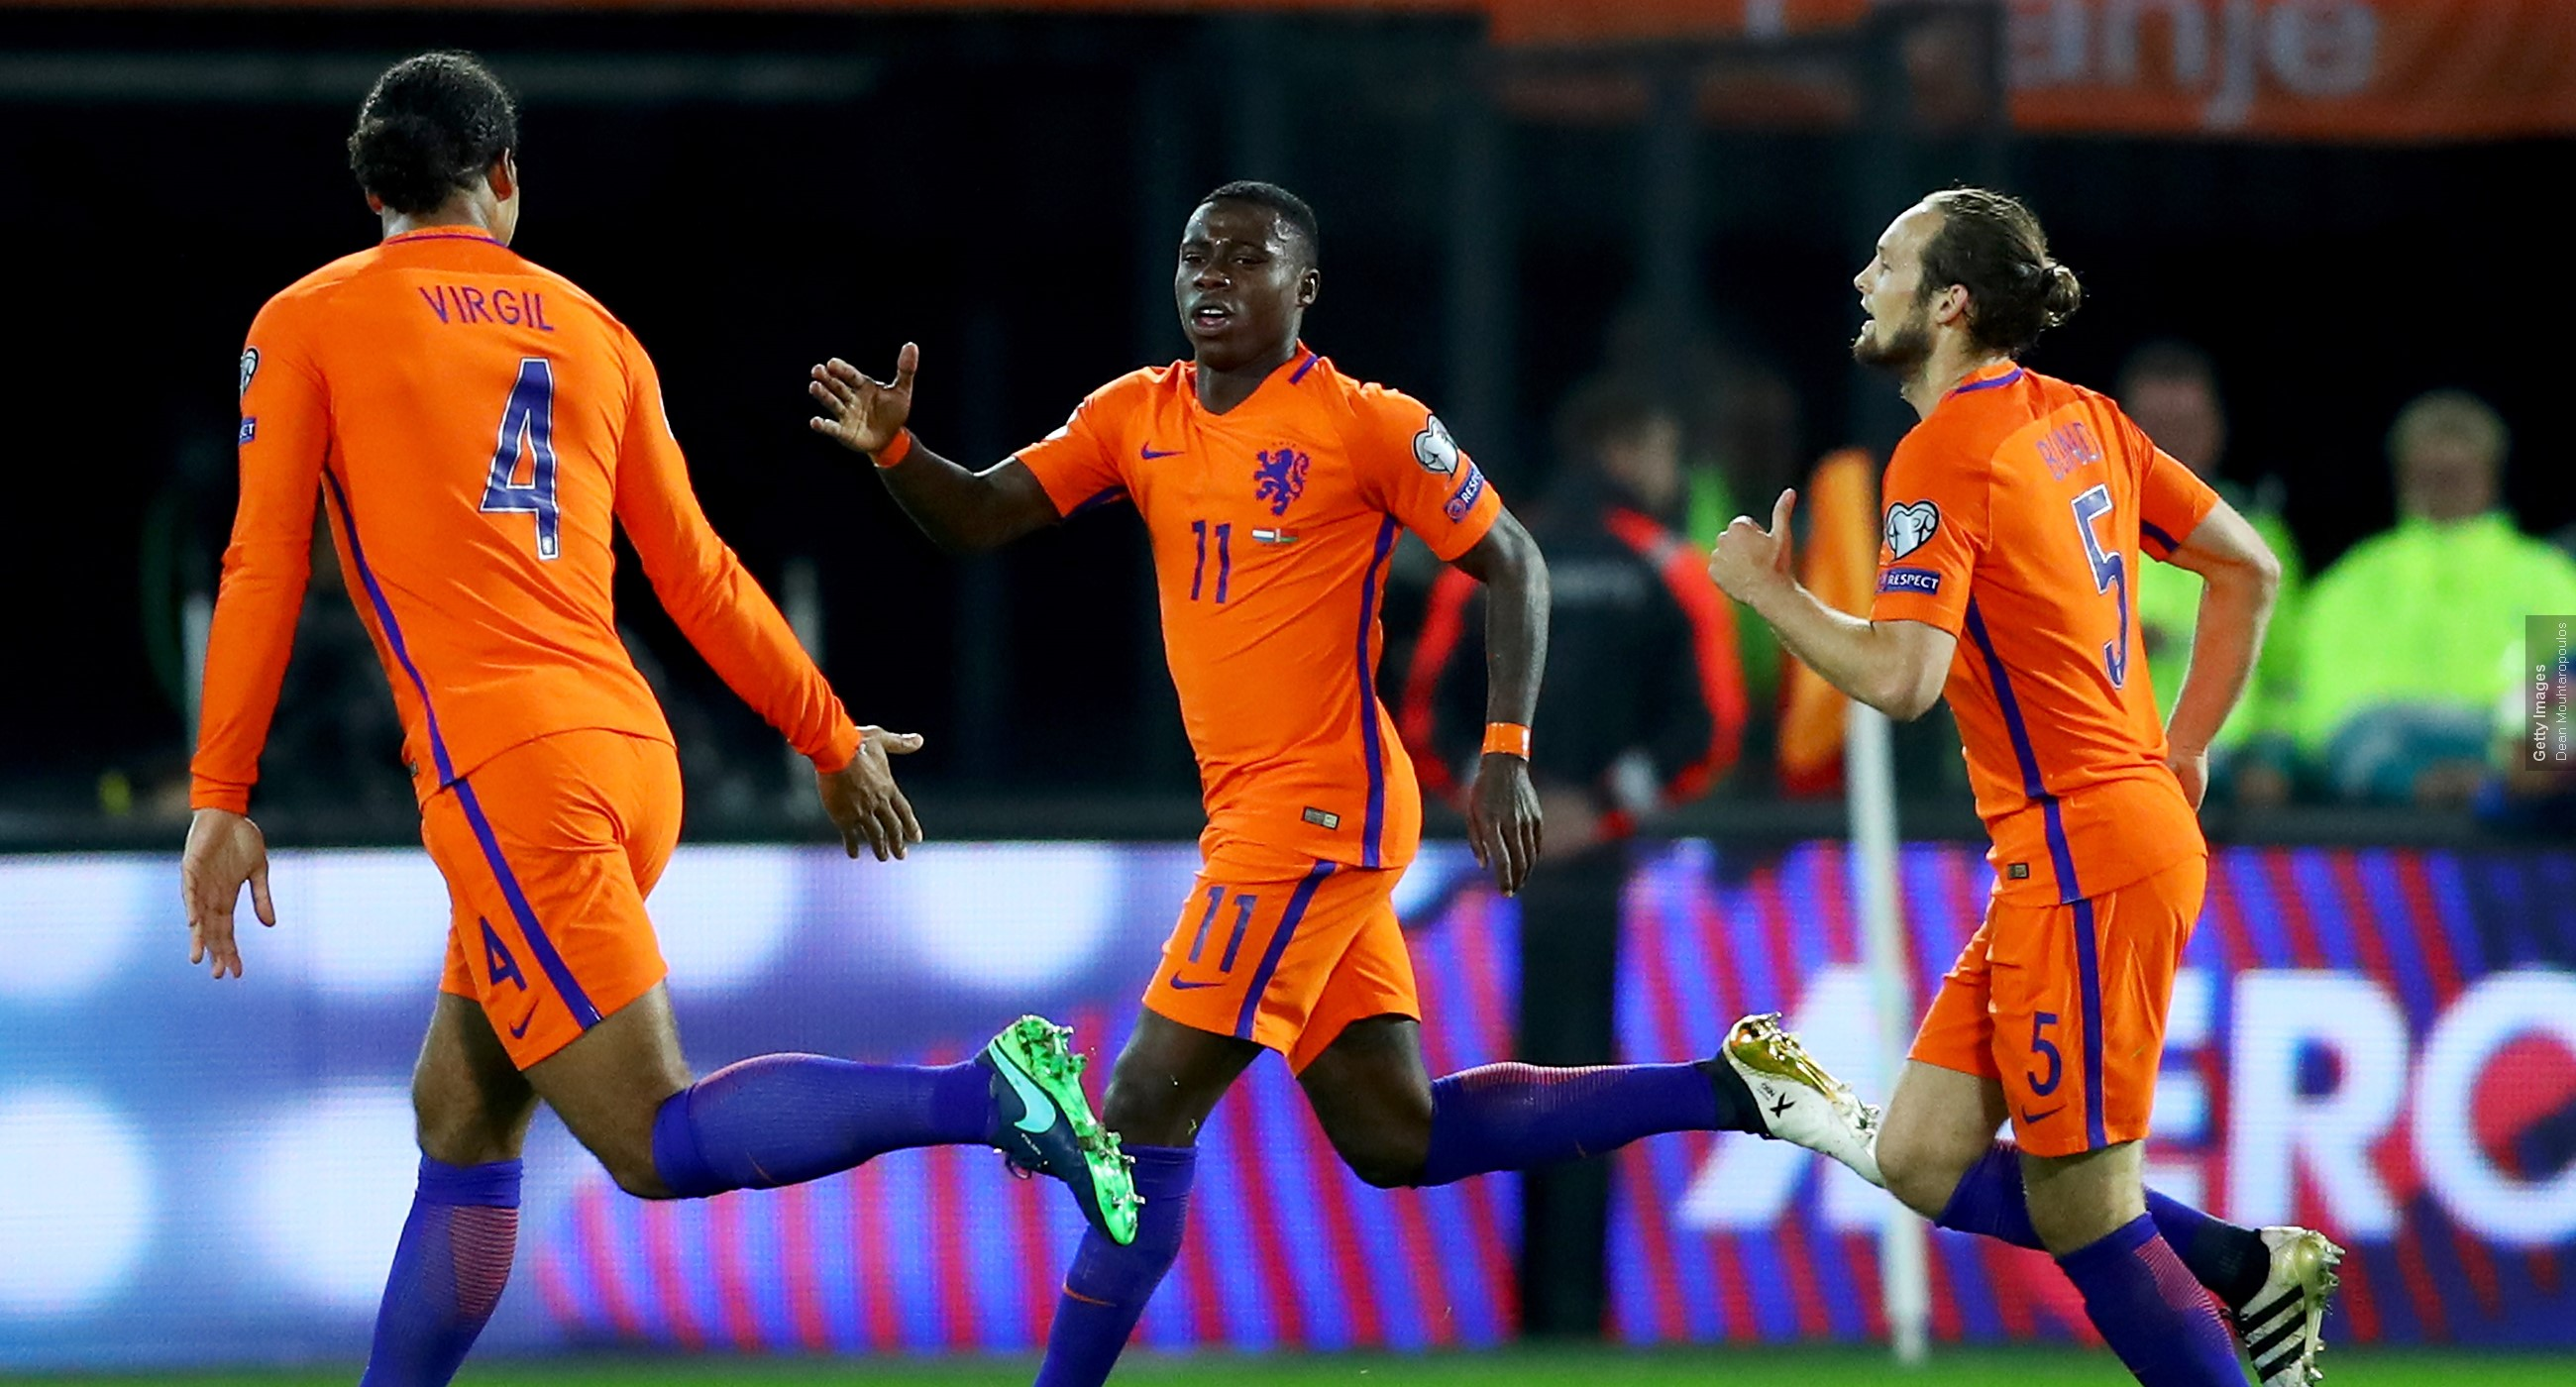 Voetbal: Nederland-Engeland